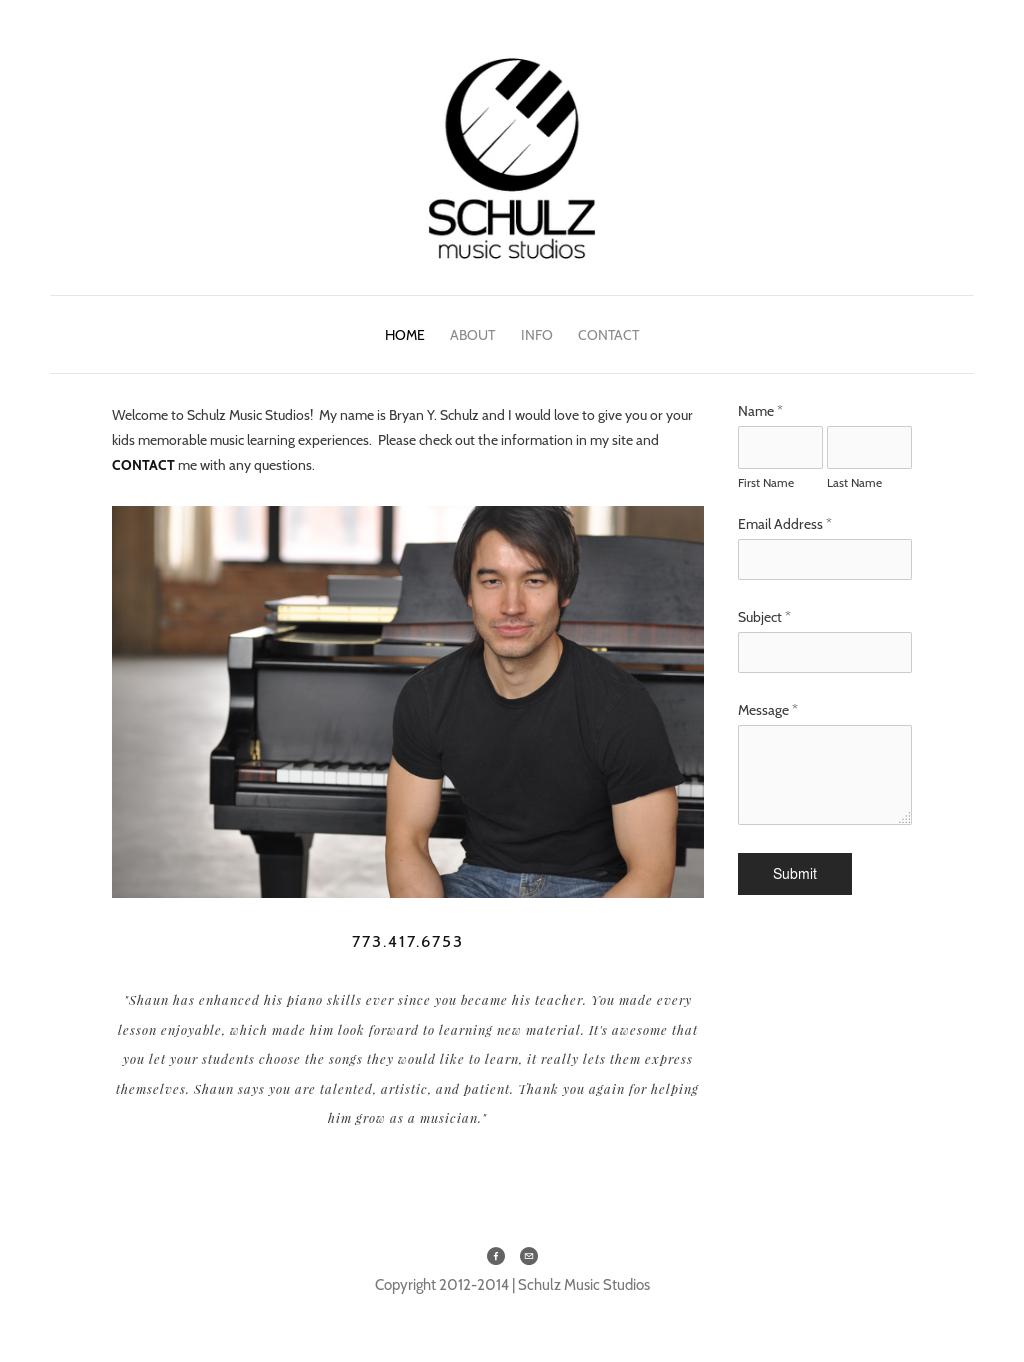 Schulz Music Studios Logo